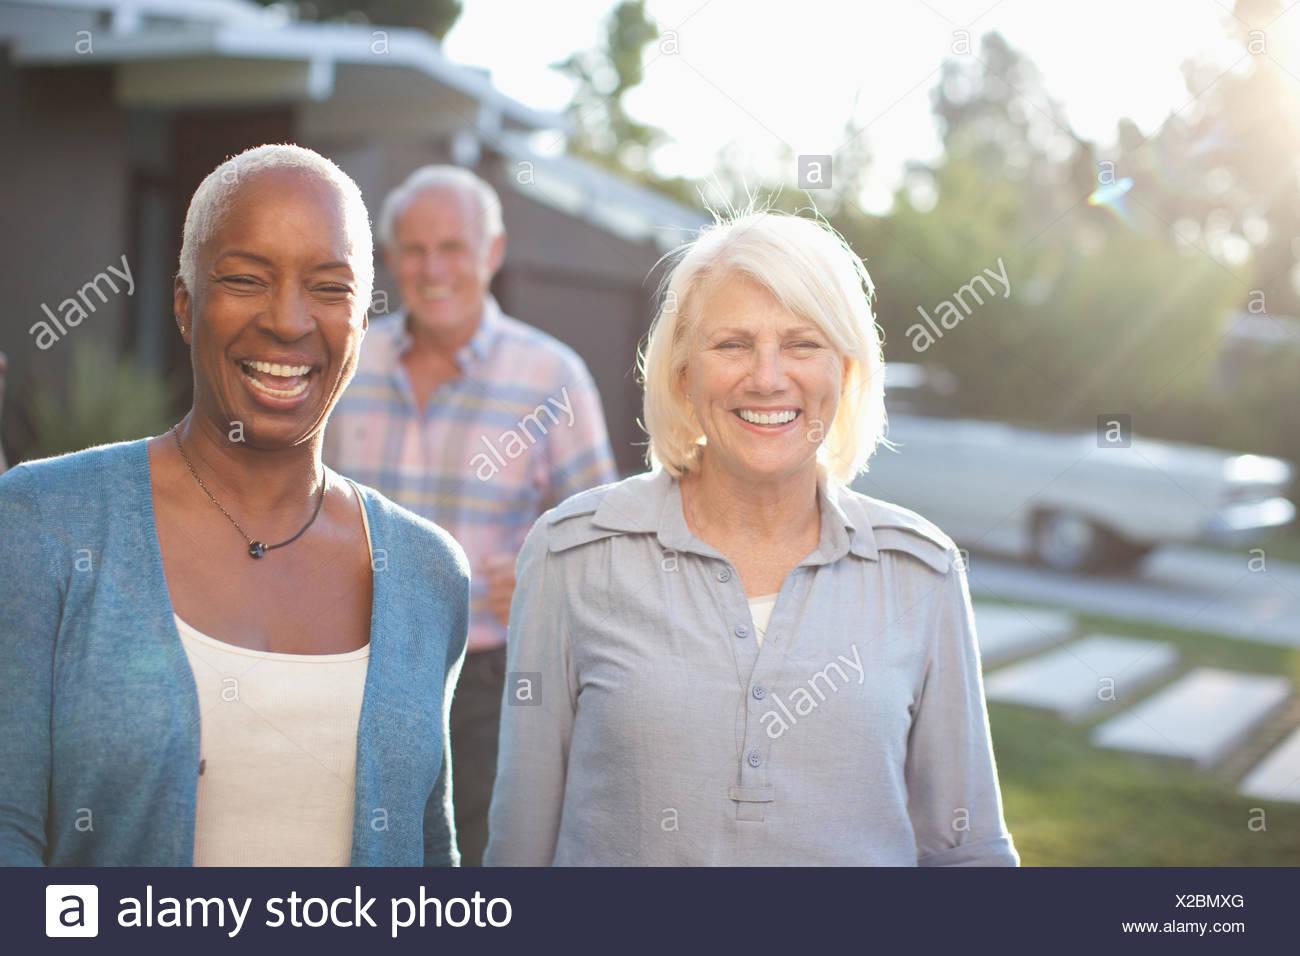 Three mature adults - Stock Image